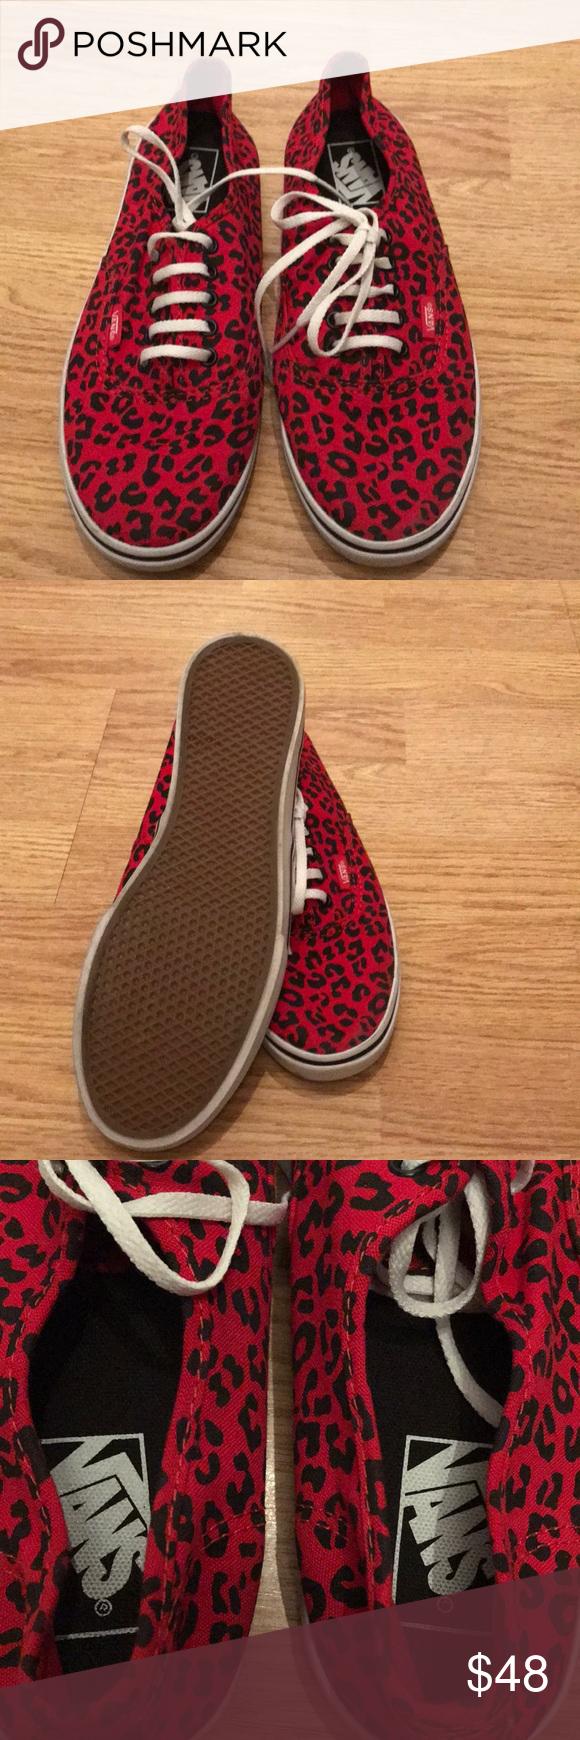 red and black leopard vans